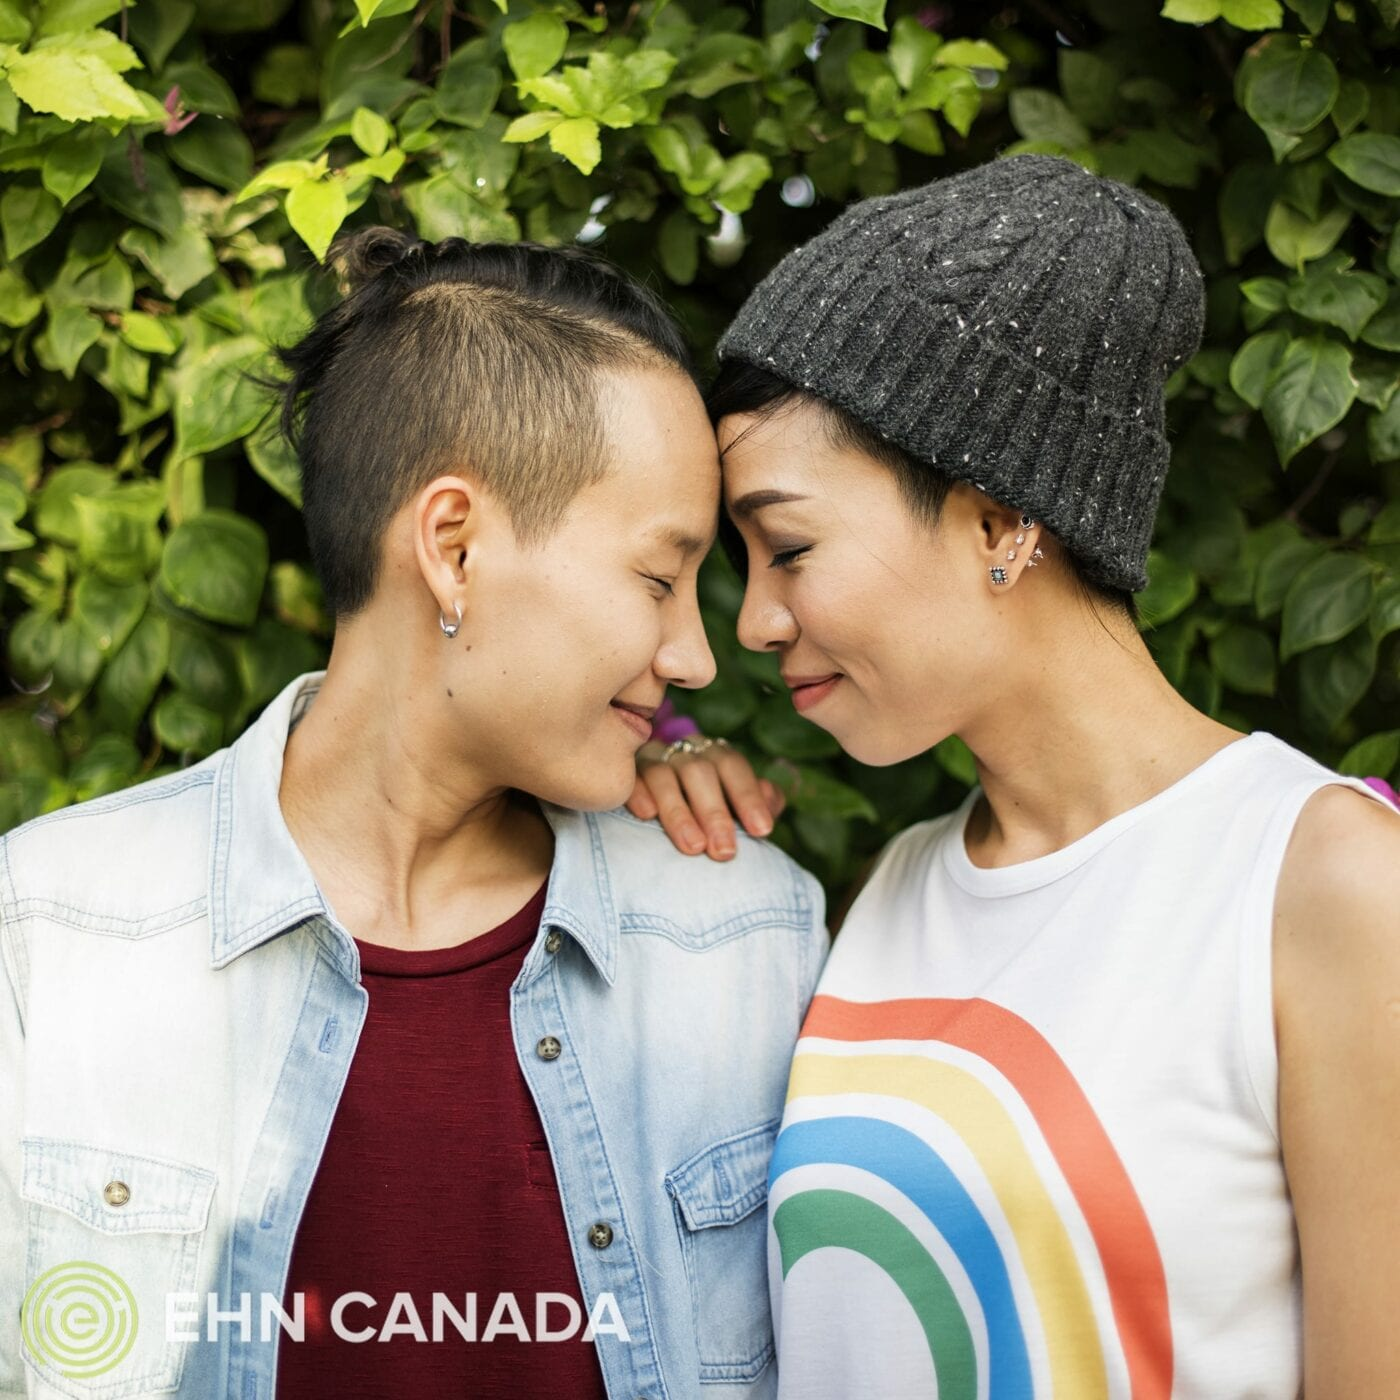 LGBTQ+ mental health and addiction